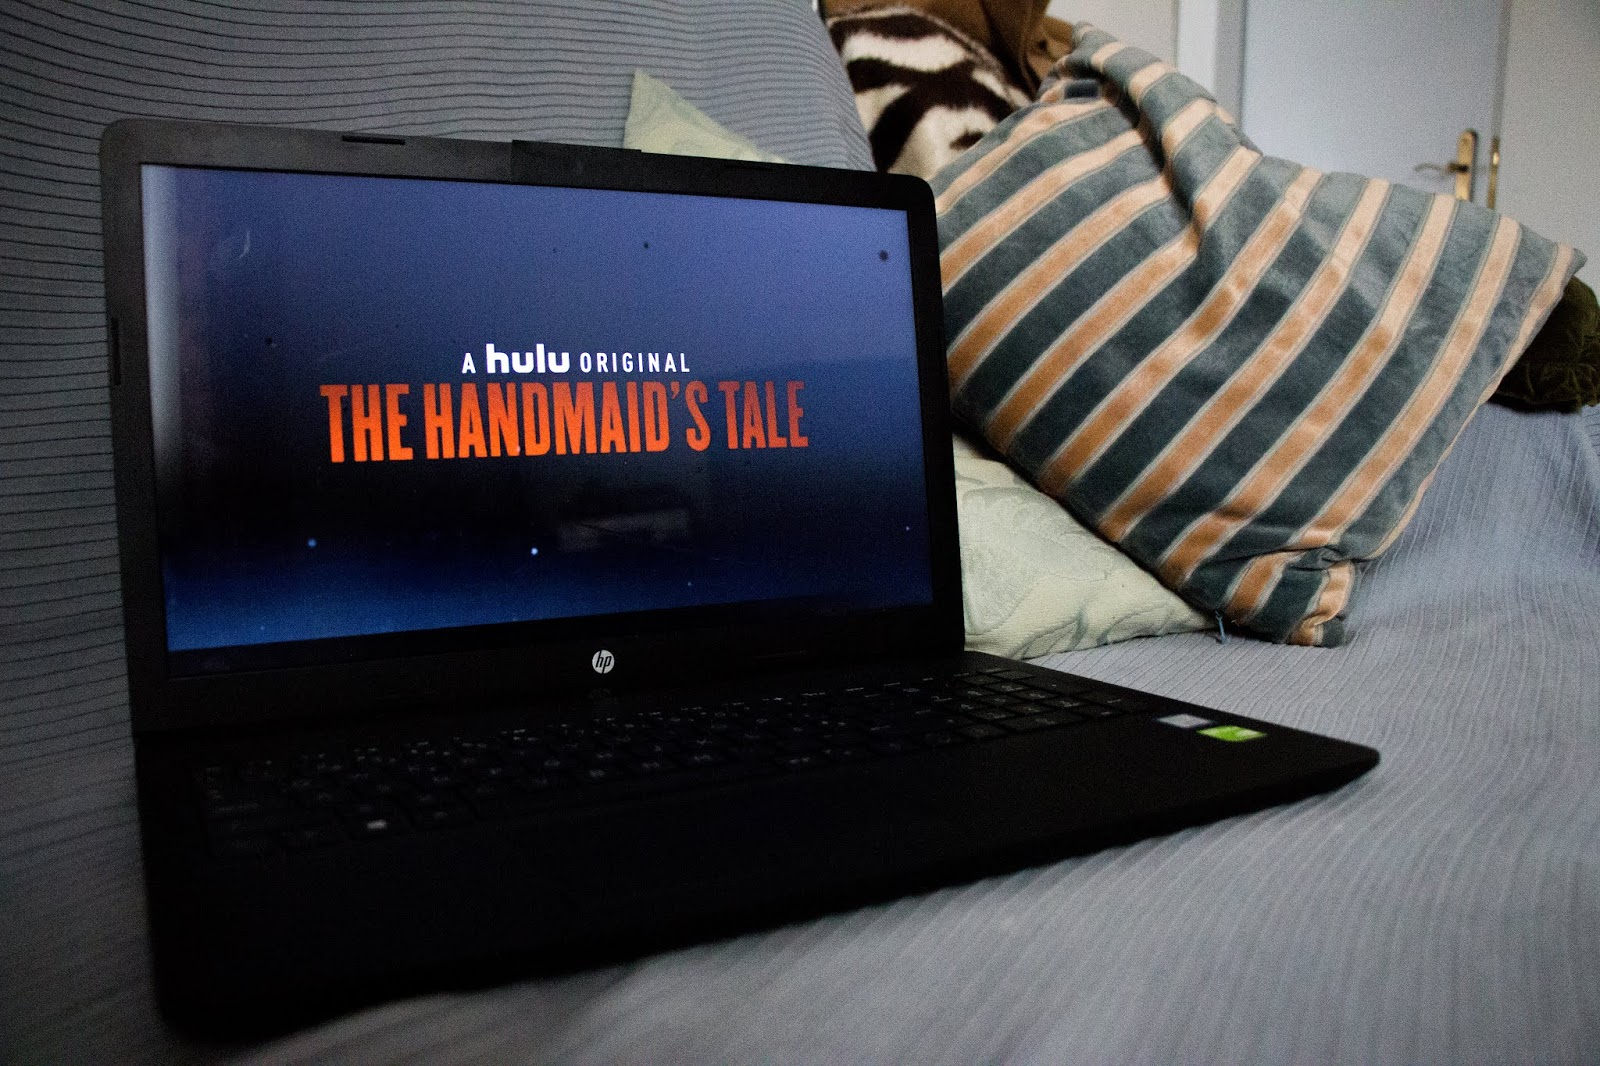 the handmaid's tale - hulu